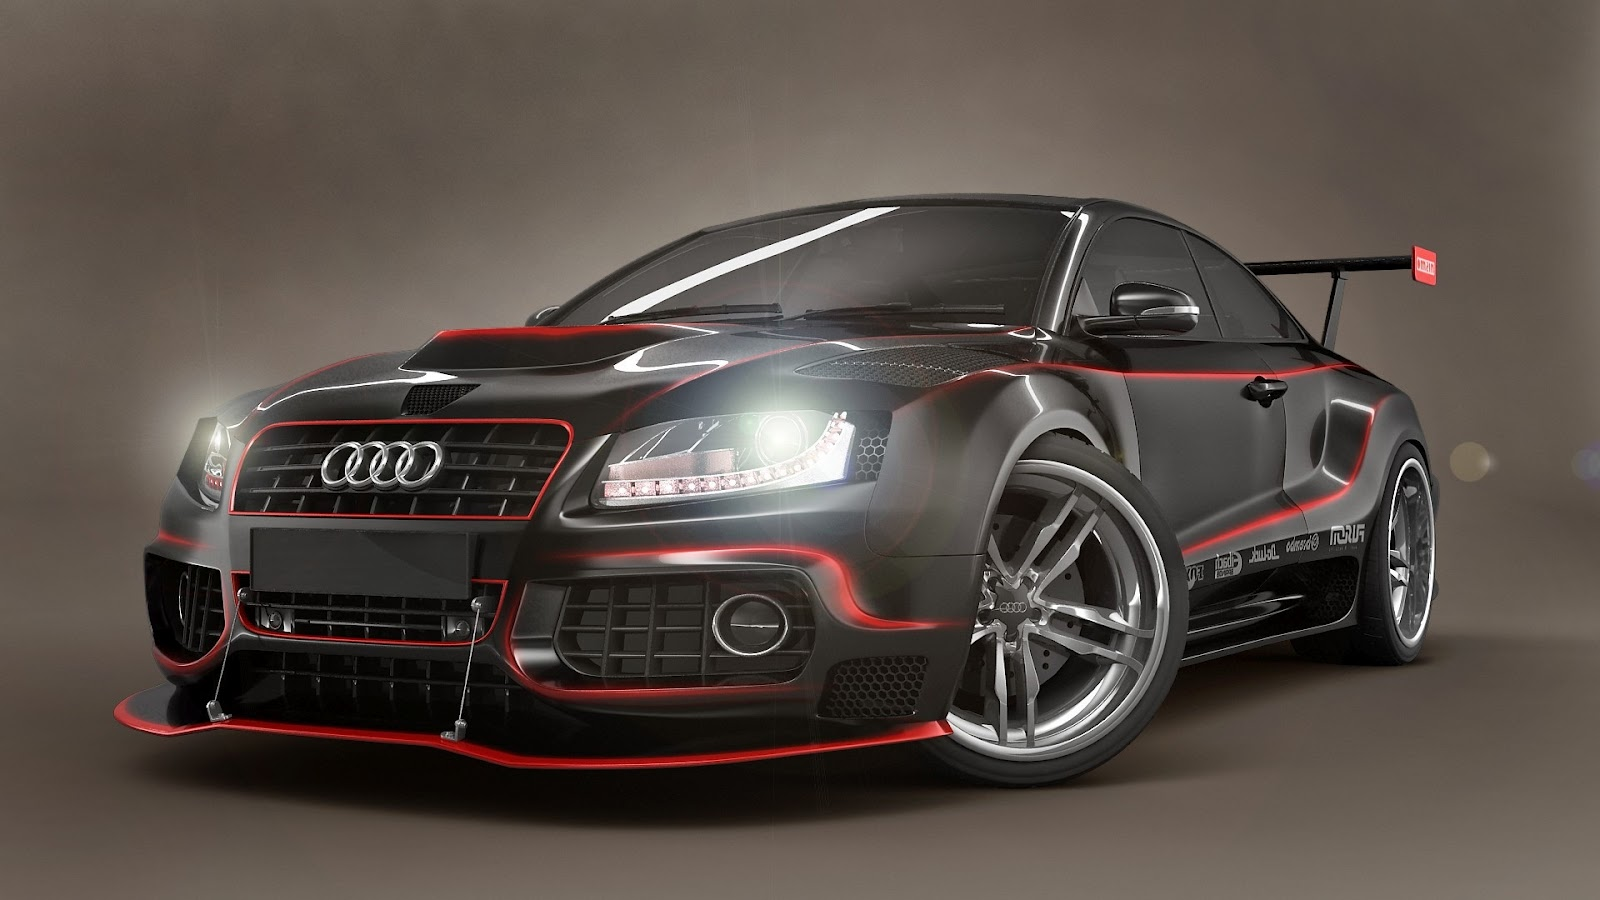 Audi Car Wallpaper For Mobile